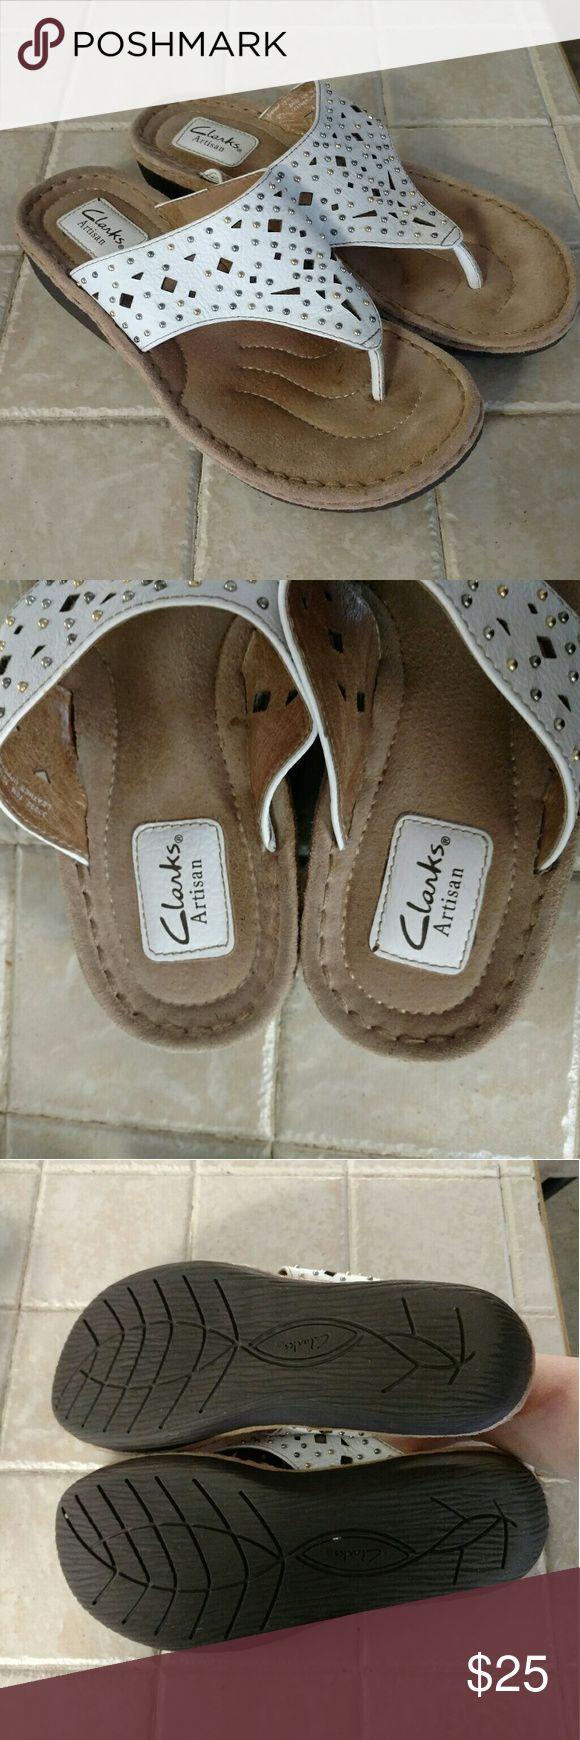 Clarks White Flip Flops Like new. Clarks Shoes Sandals